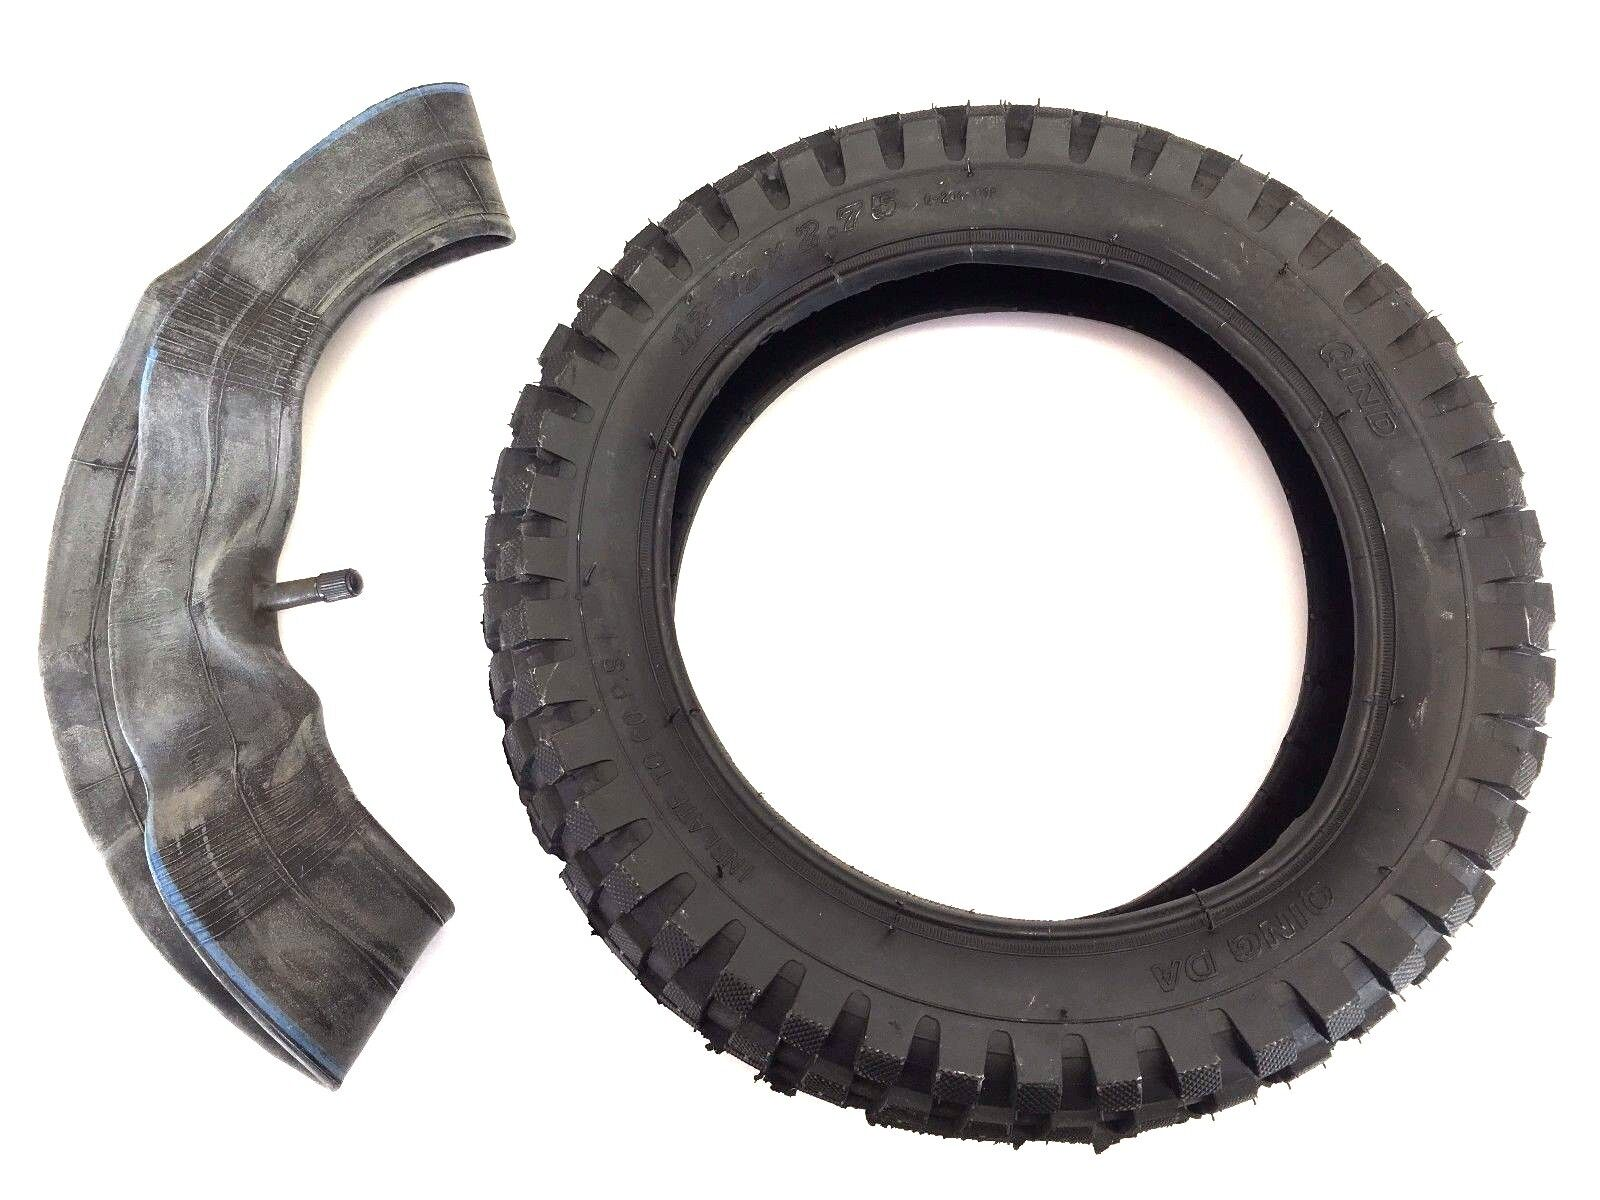 12.5 X  2.75 Tubo Interior & Neumático Razor MX350 MX400 Dirt Bike cohete 12 1 2 X 2 3 4  salida